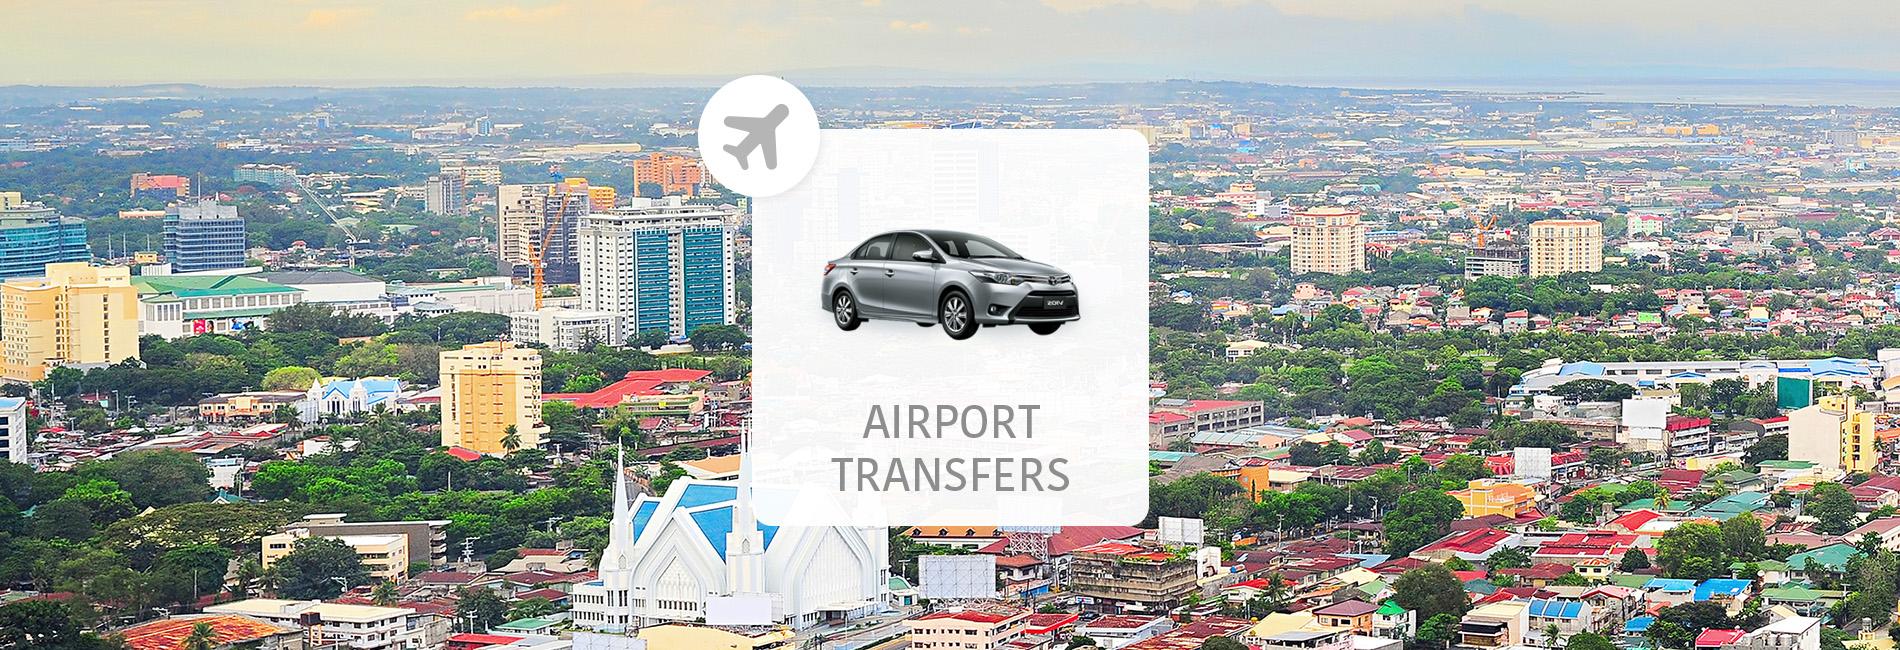 Cebu Private Transfer From International Airport Ceb To New Kijang Innova 24 G A T Booking Fee Downtown Kkday